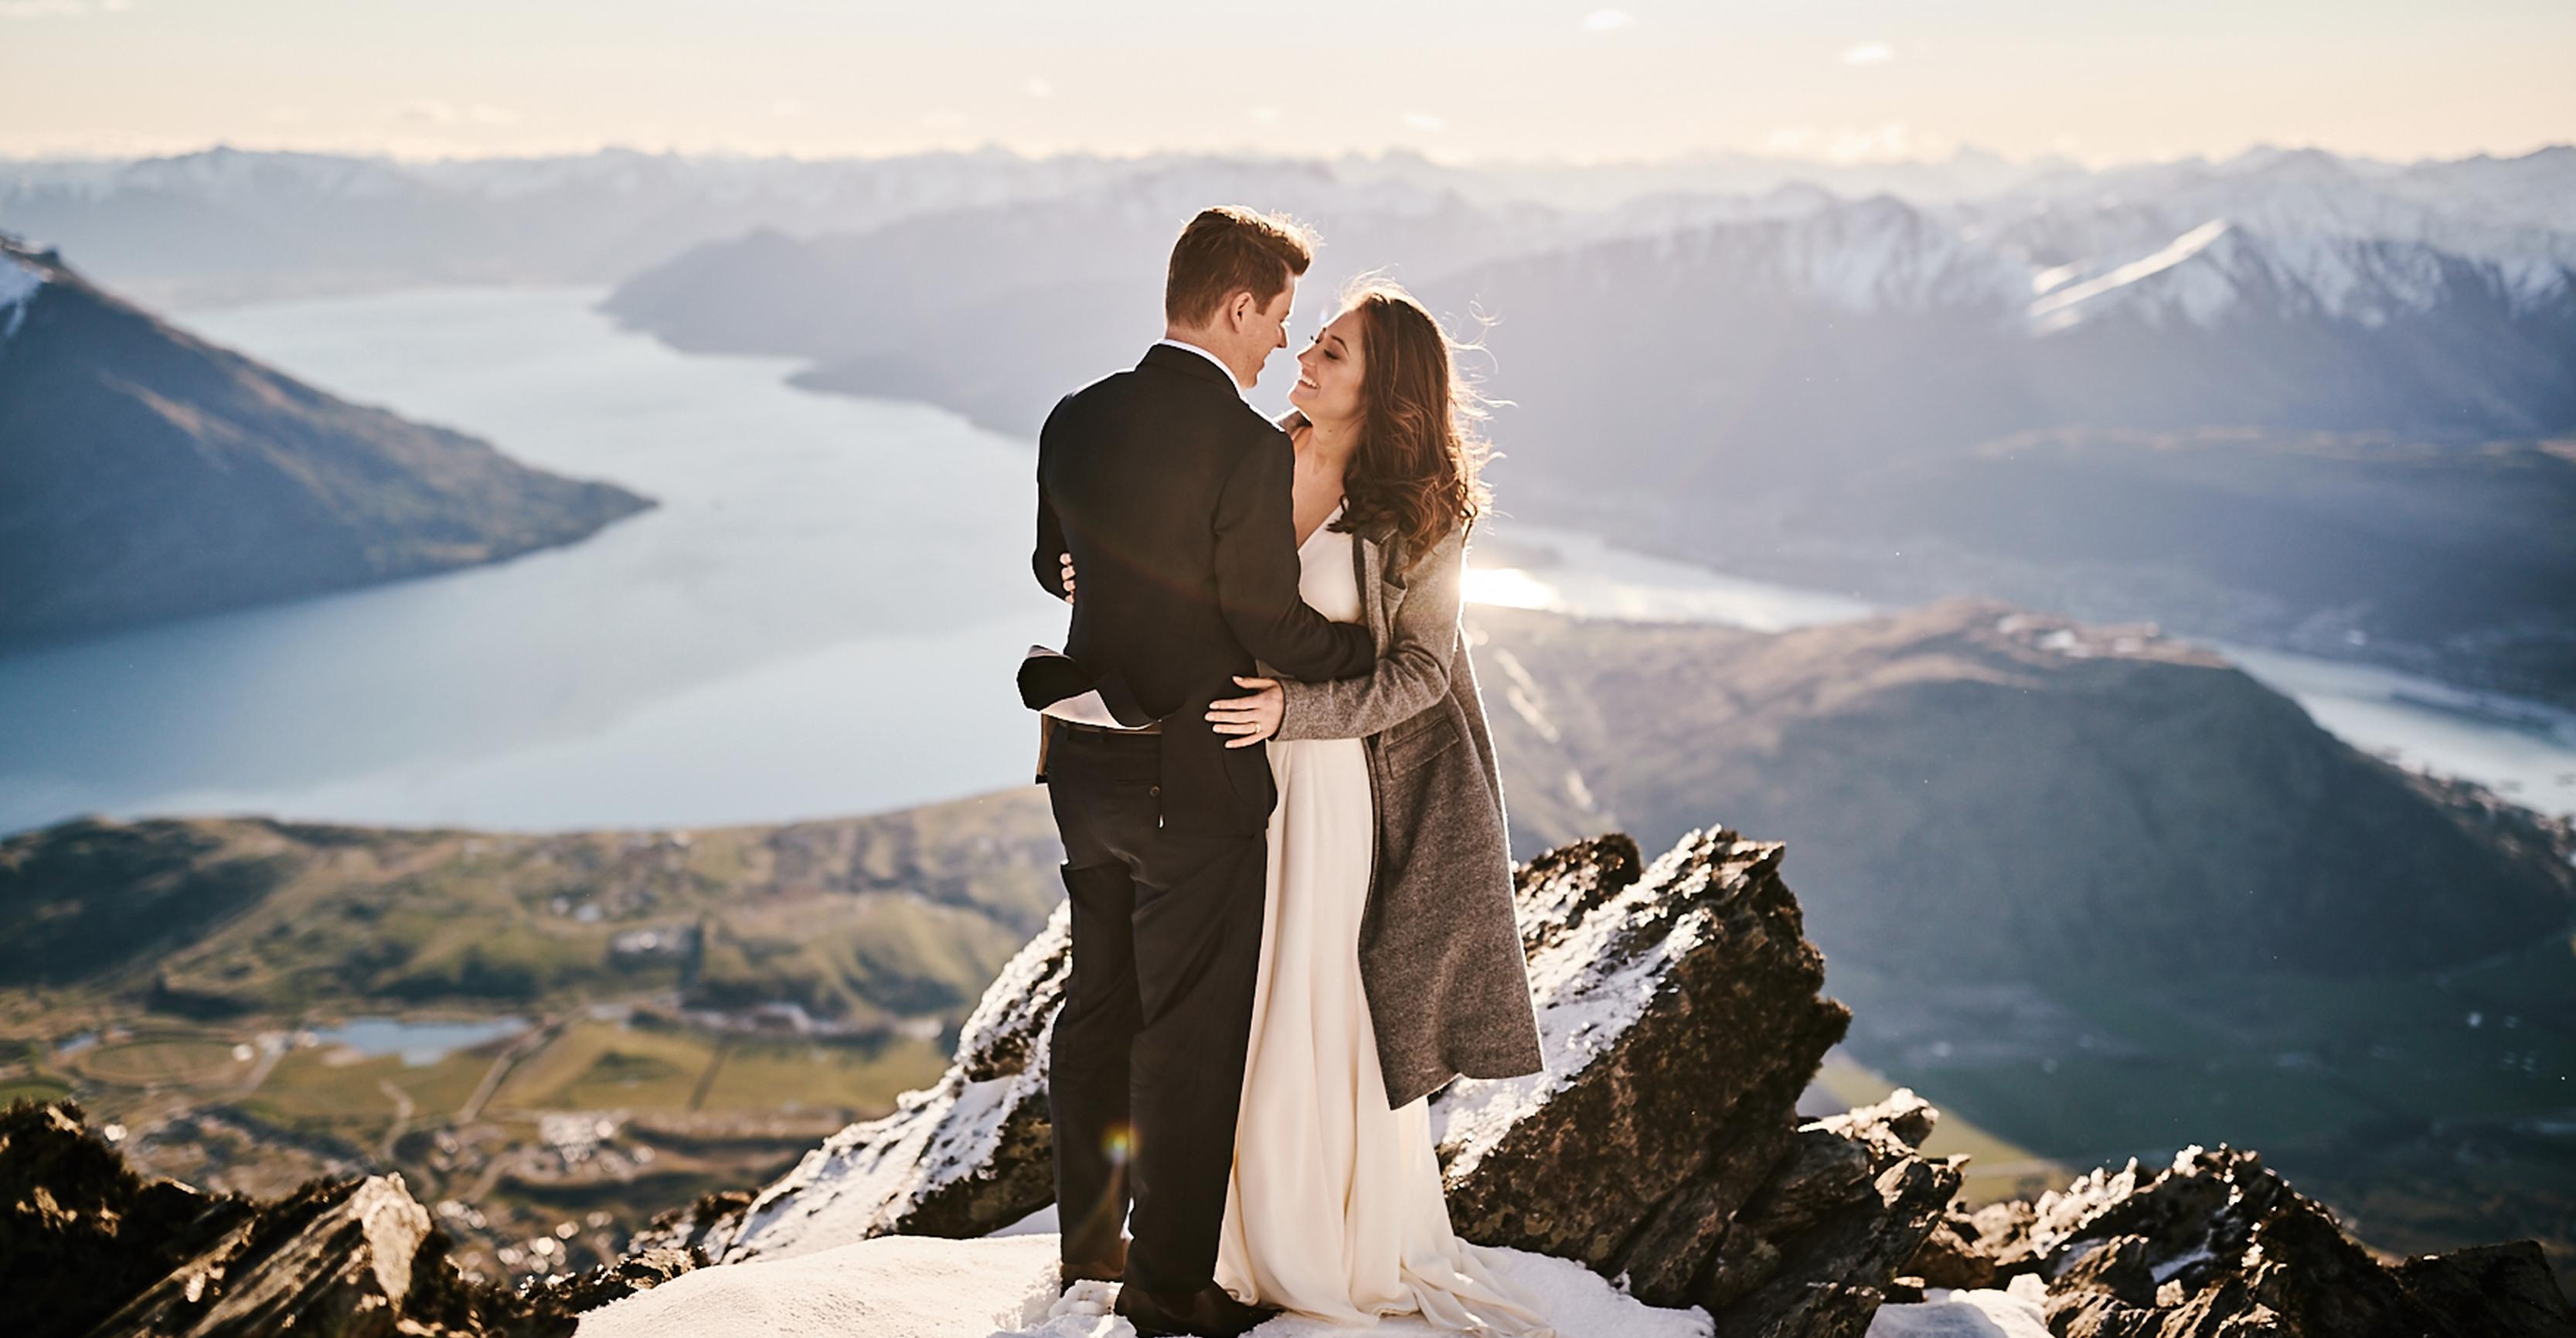 Keira  + Jared   Queenstown, New Zealand   The Hilton Queenstown